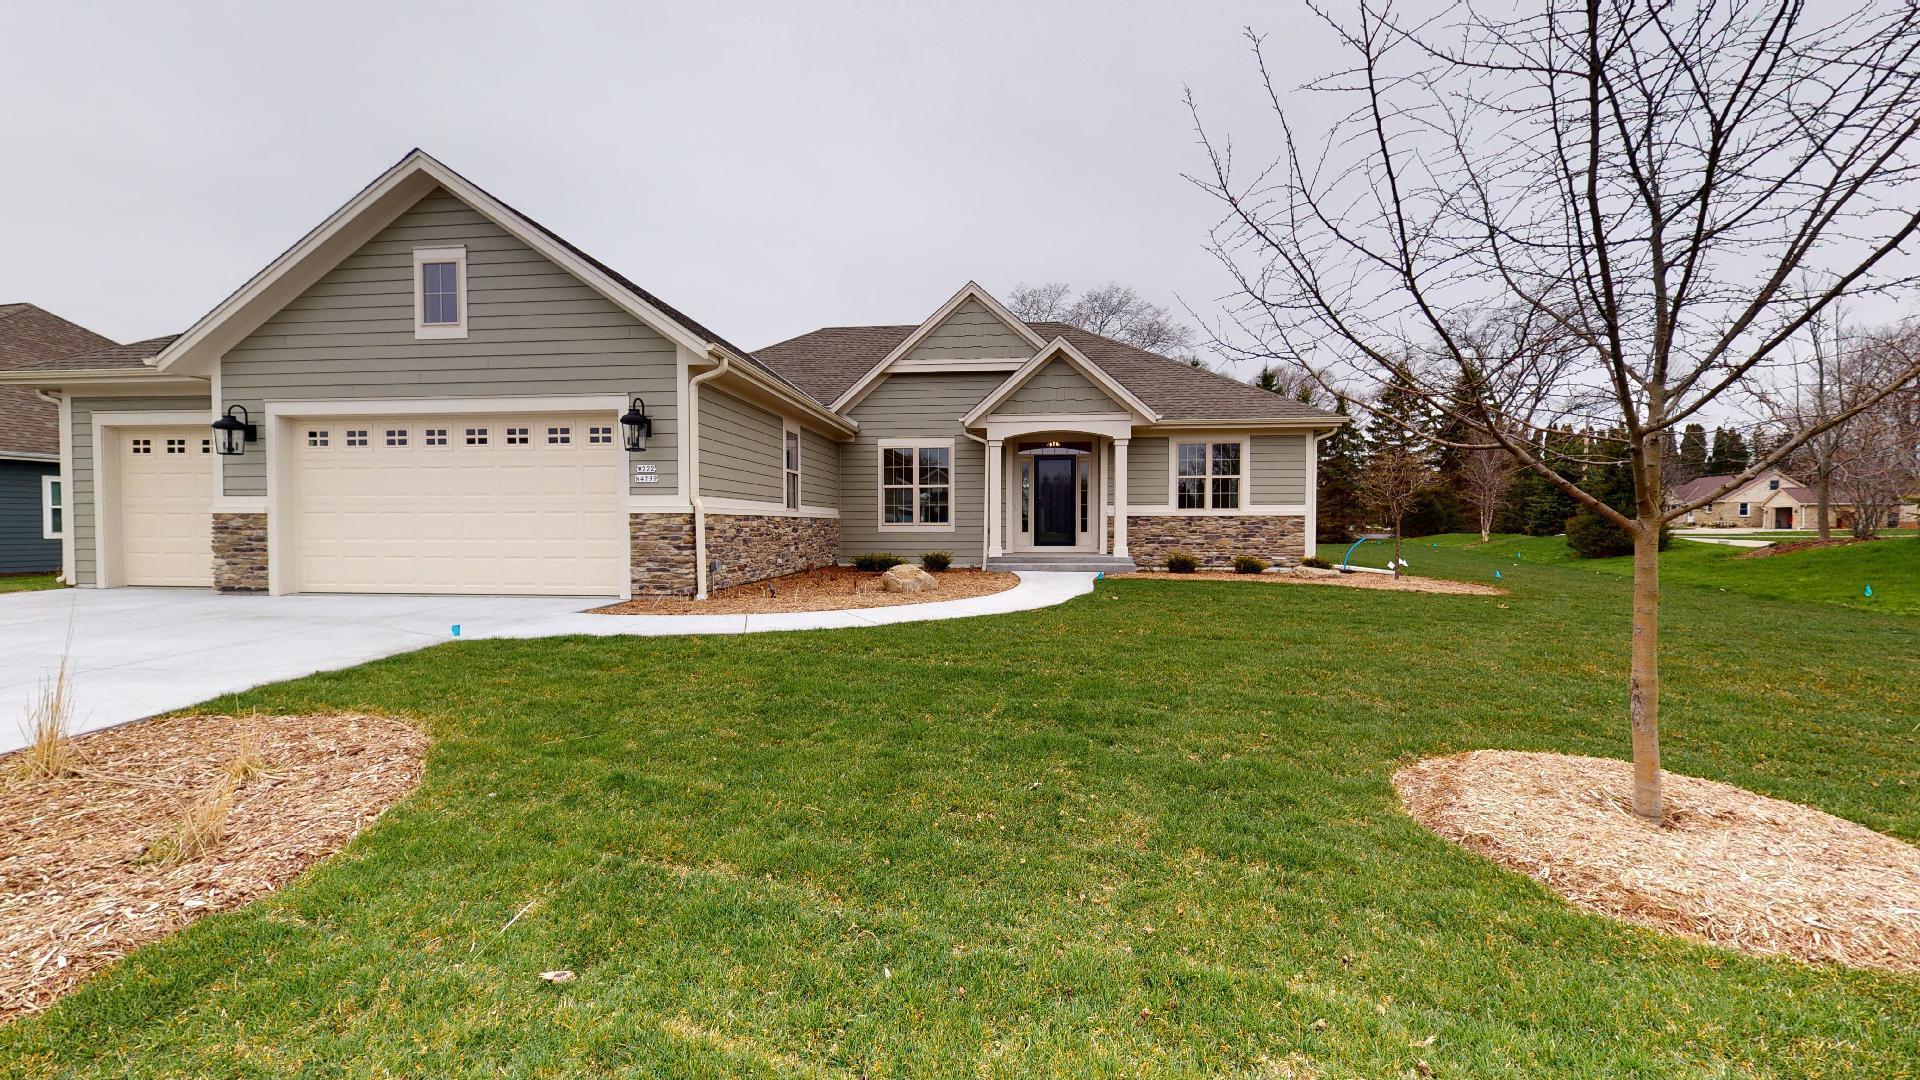 W222N4799 Seven Oaks Dr, Pewaukee, Wisconsin 53072, 3 Bedrooms Bedrooms, ,2 BathroomsBathrooms,Single-Family,For Sale,Seven Oaks Dr,1712779